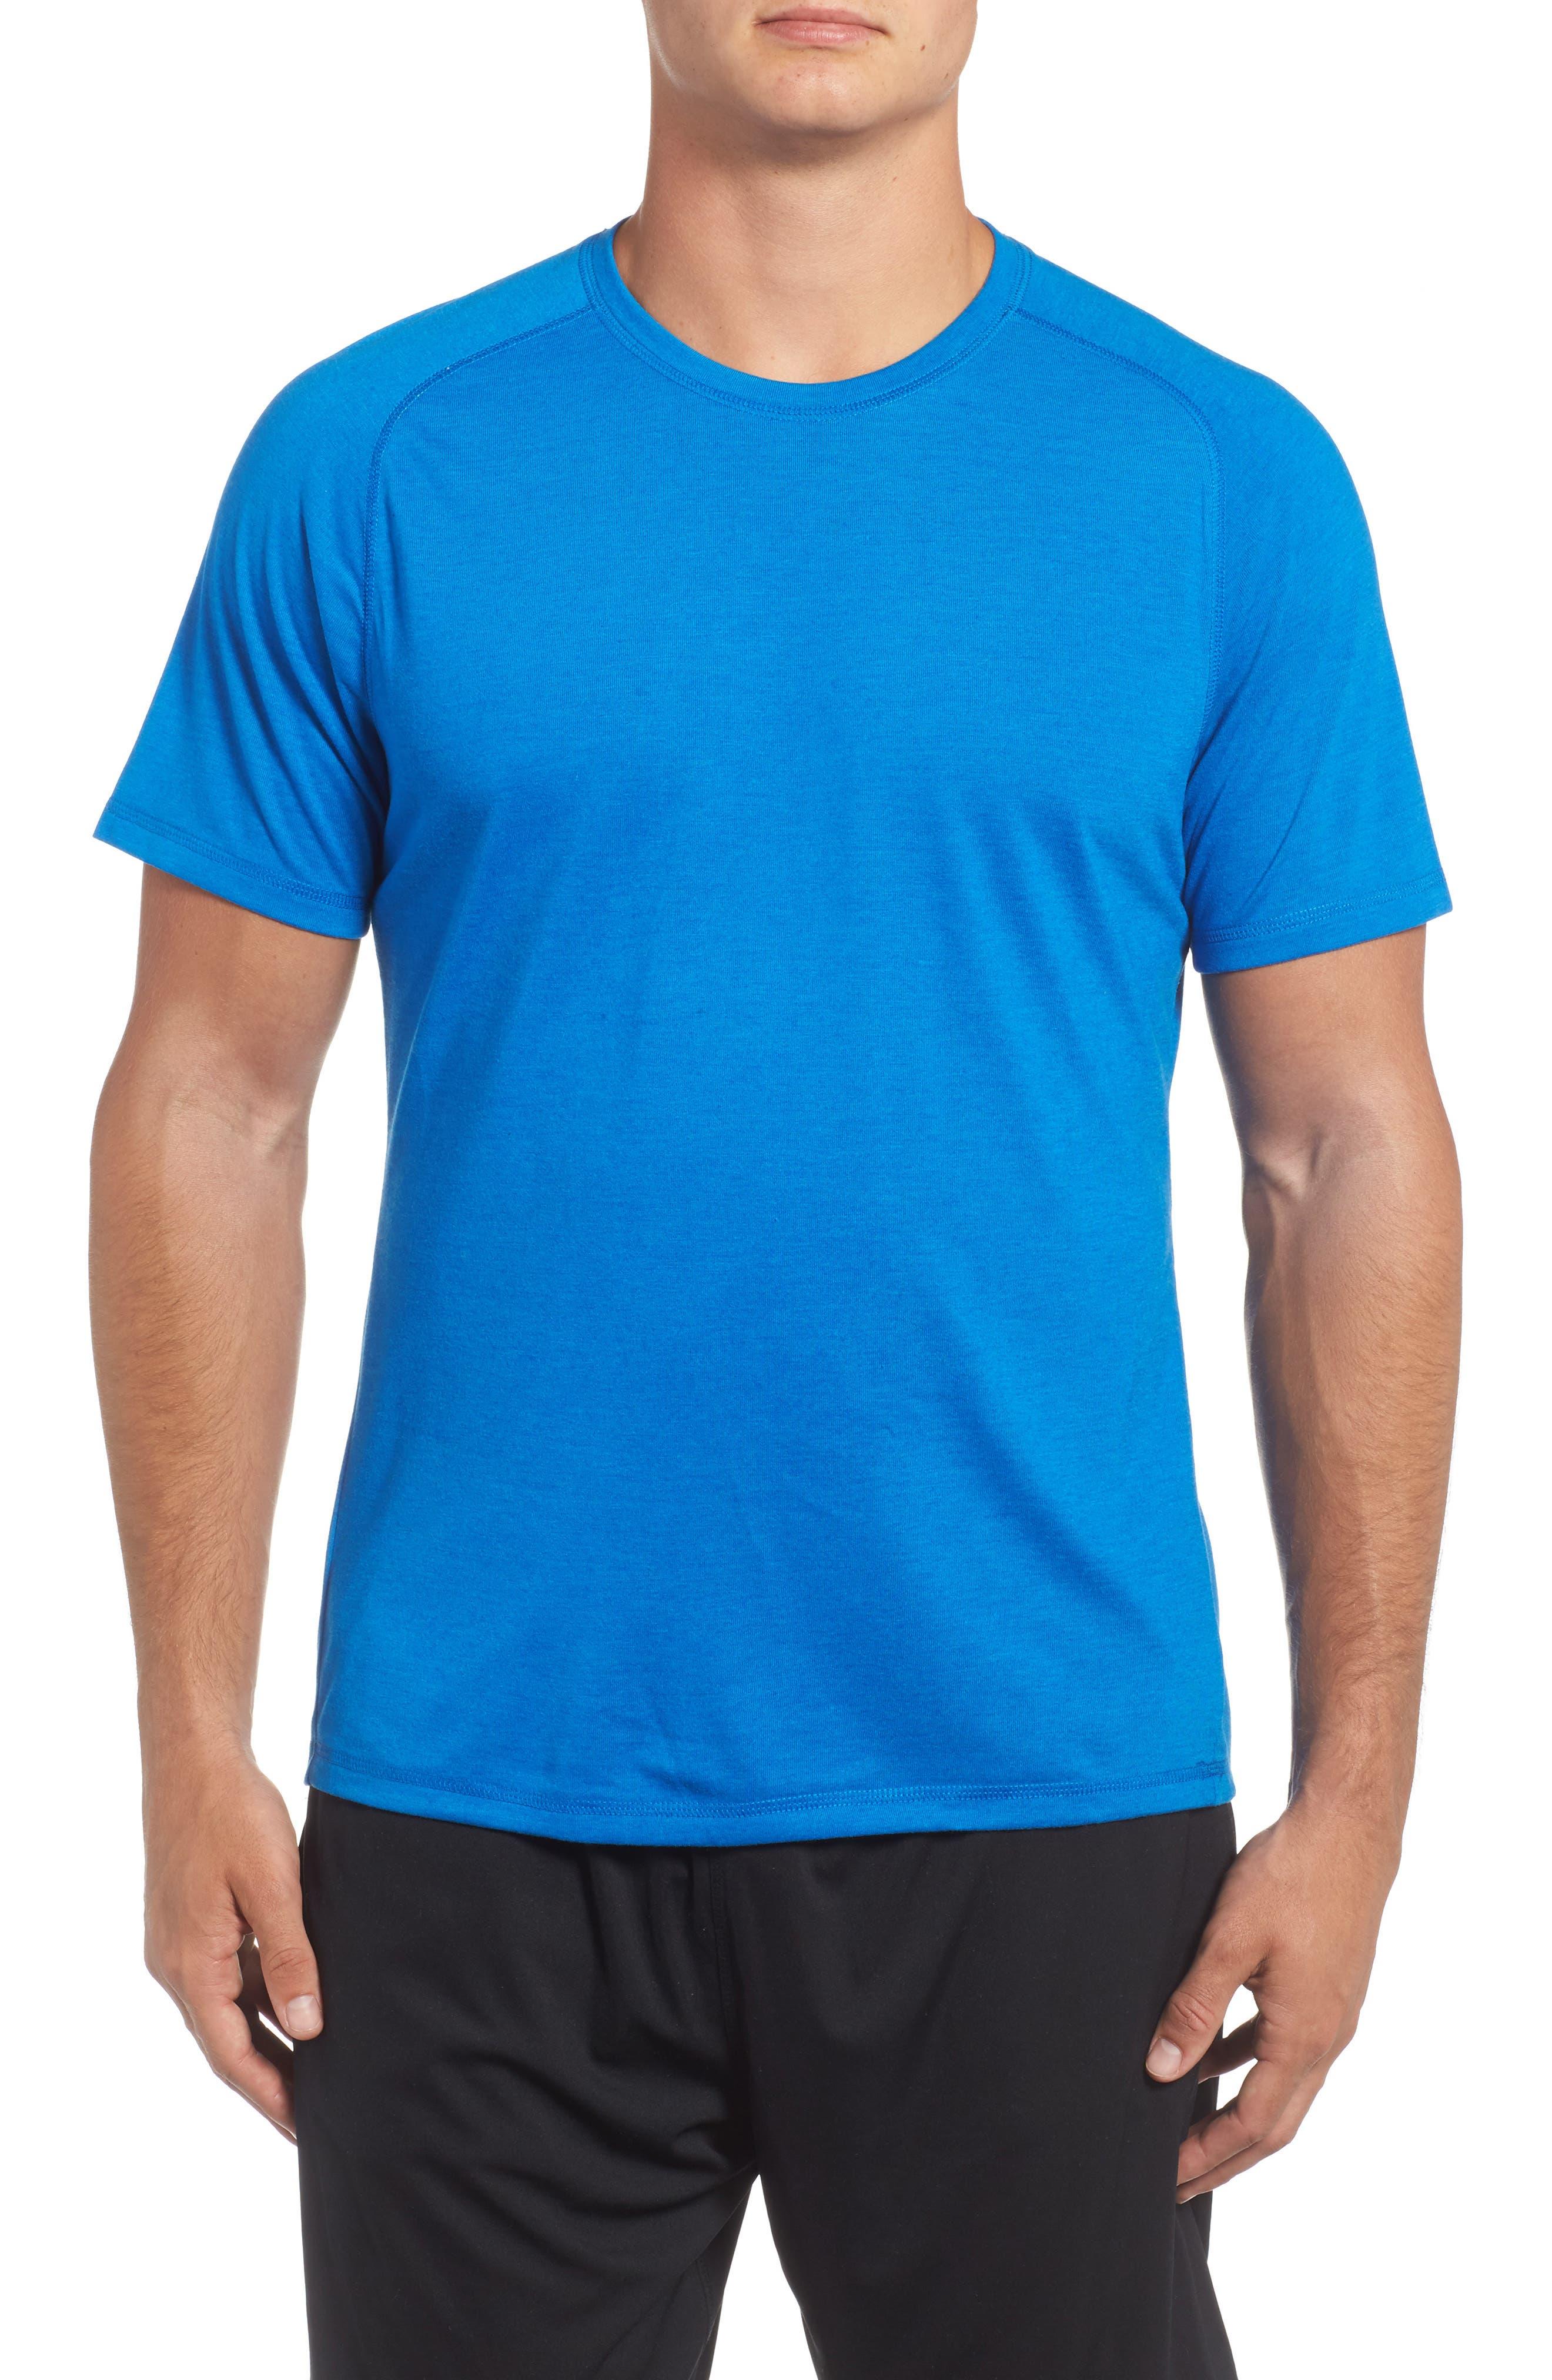 Alternate Image 1 Selected - Zella Celsian Training T-Shirt